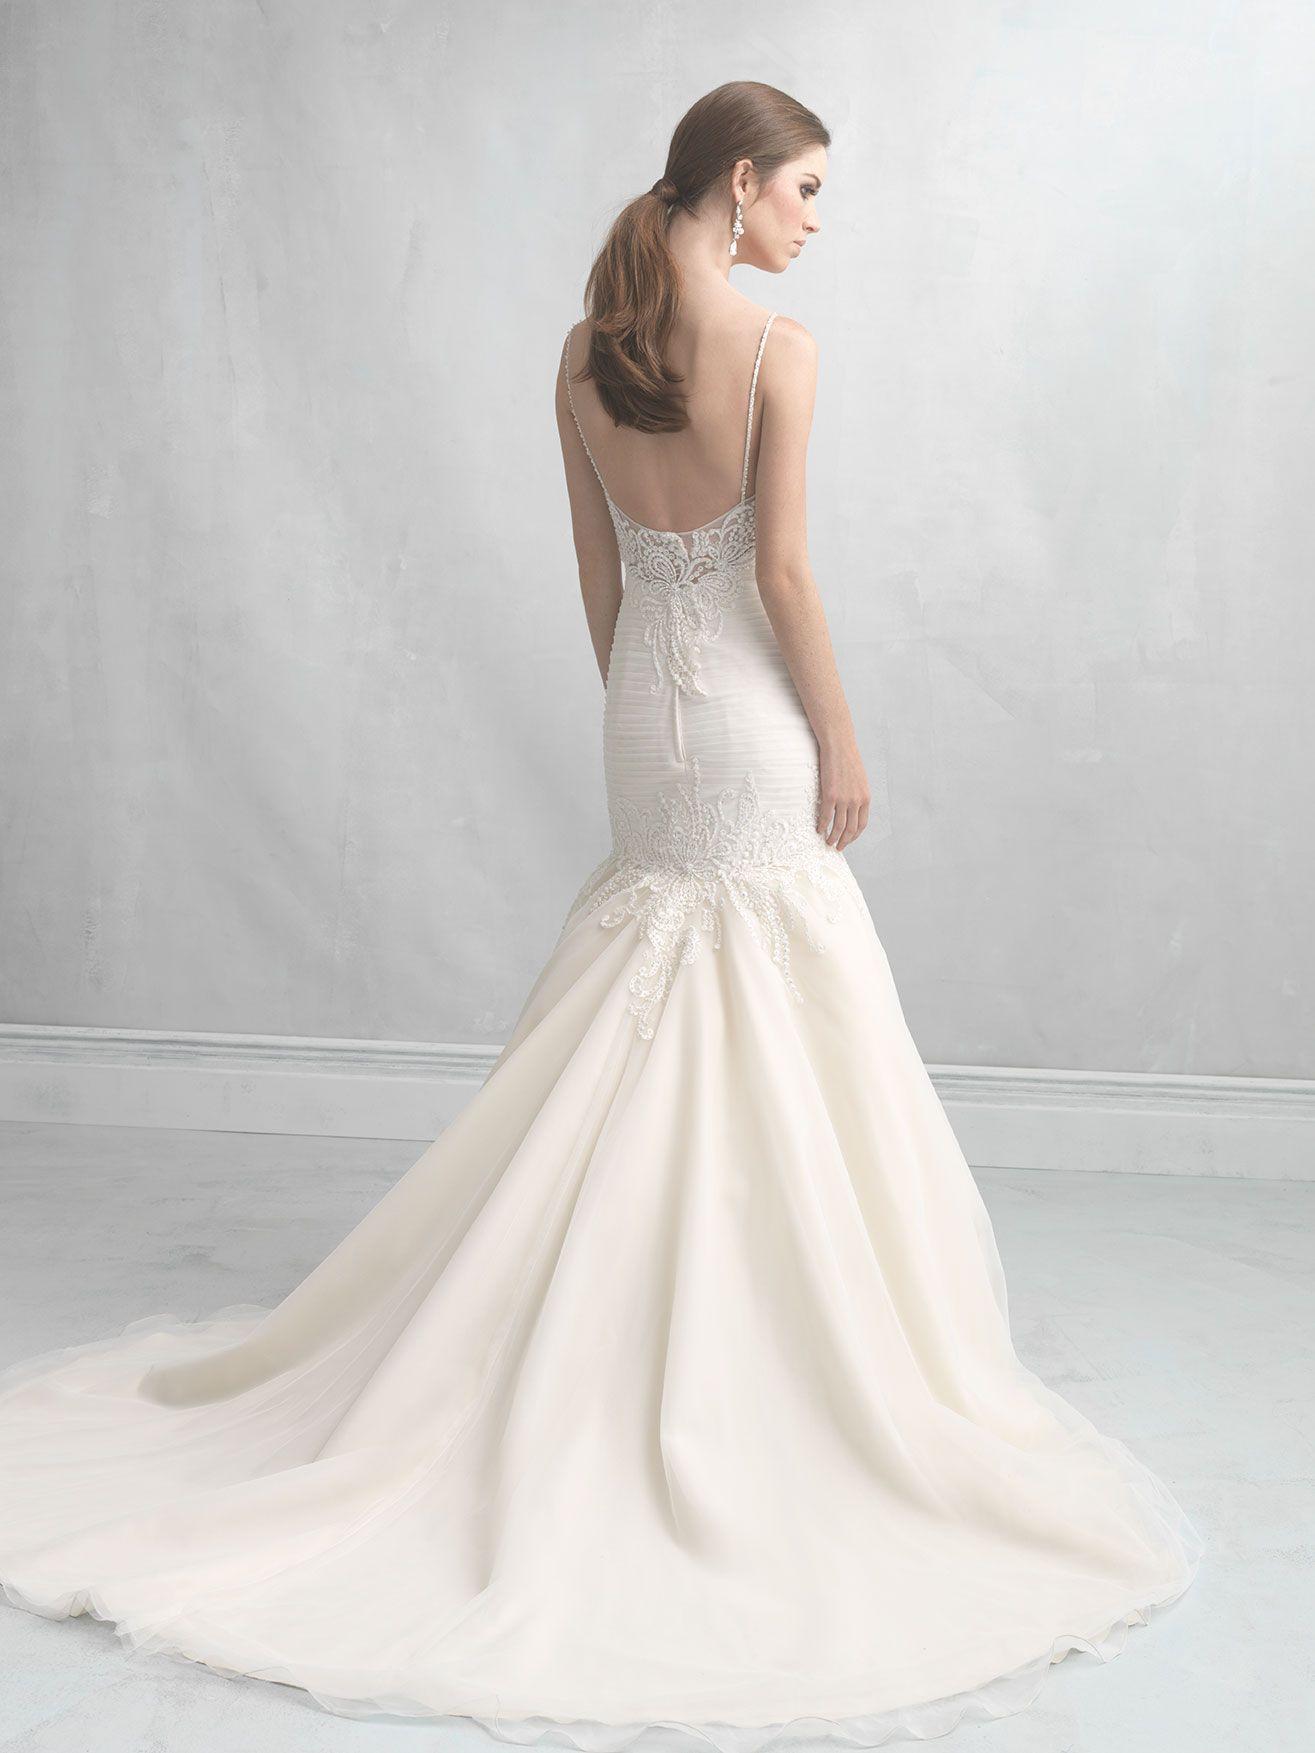 Wedding dresses styles  Madison James  Style MJ  madison james  Pinterest  Special